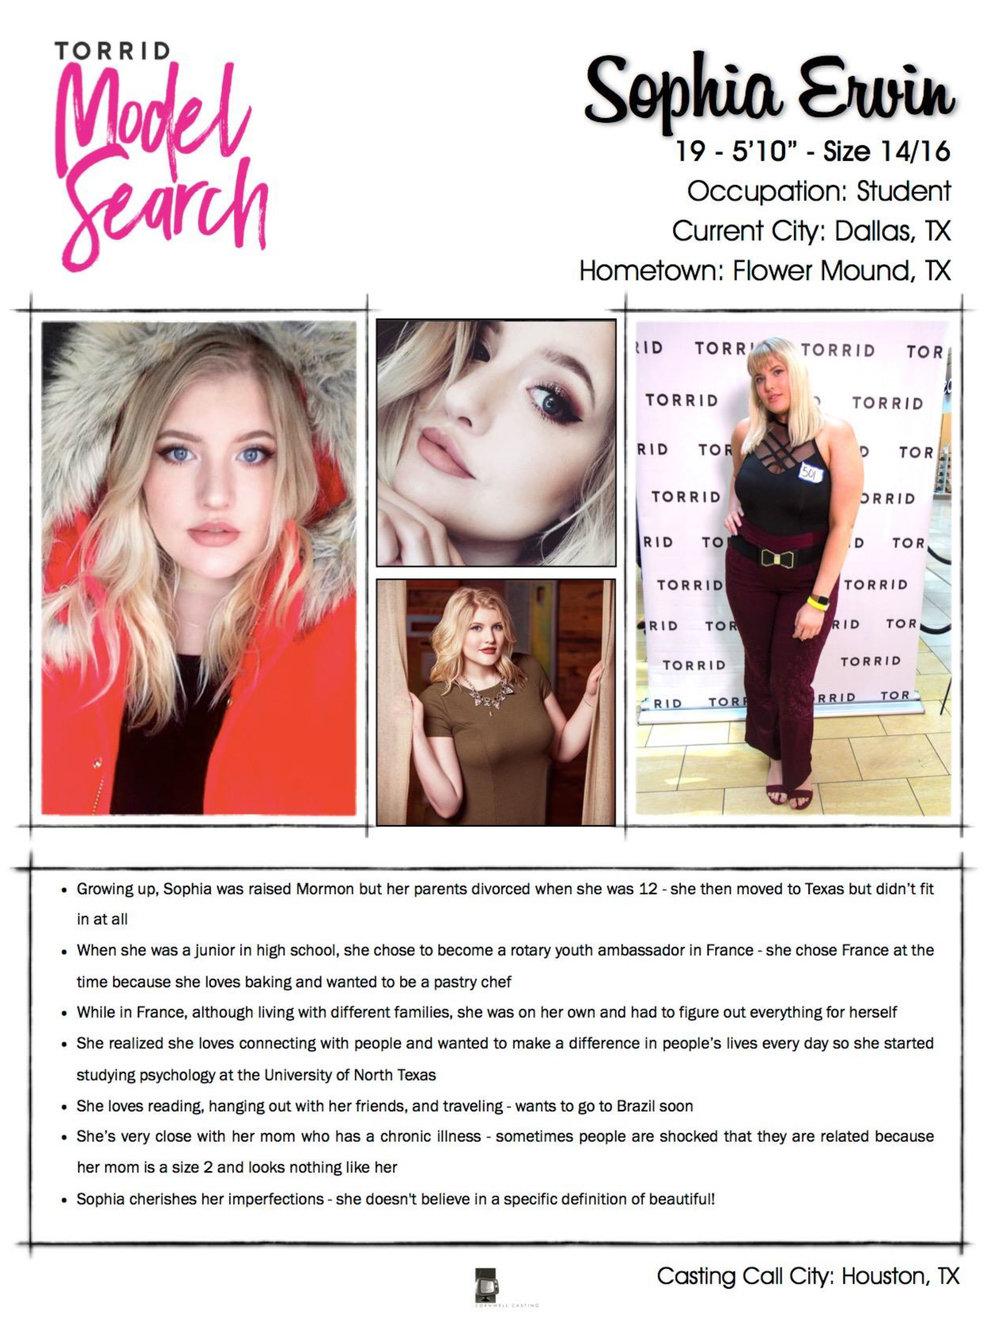 Sophia-Ervin-Dallas-TX.jpg